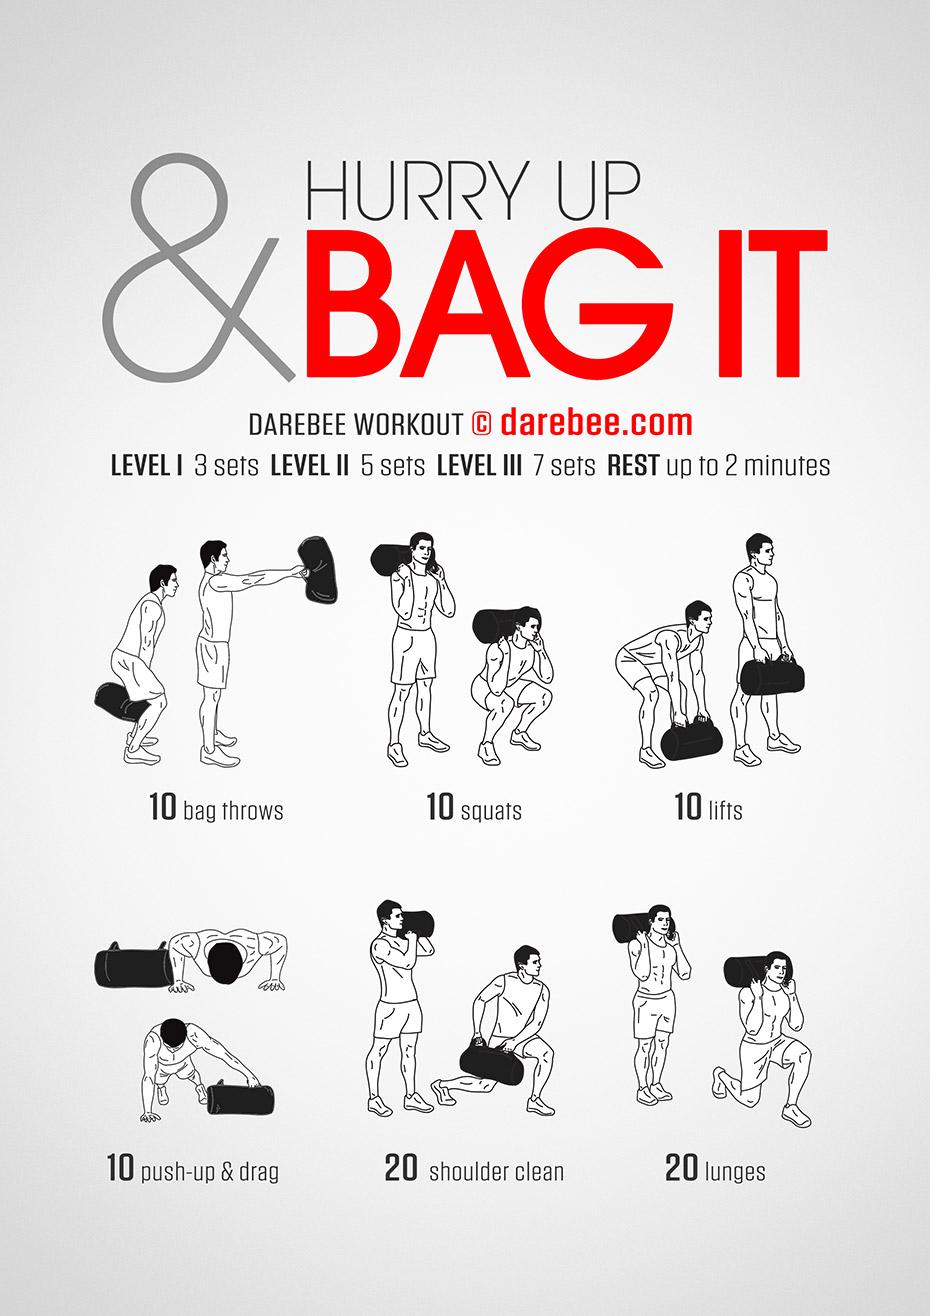 bagit workout